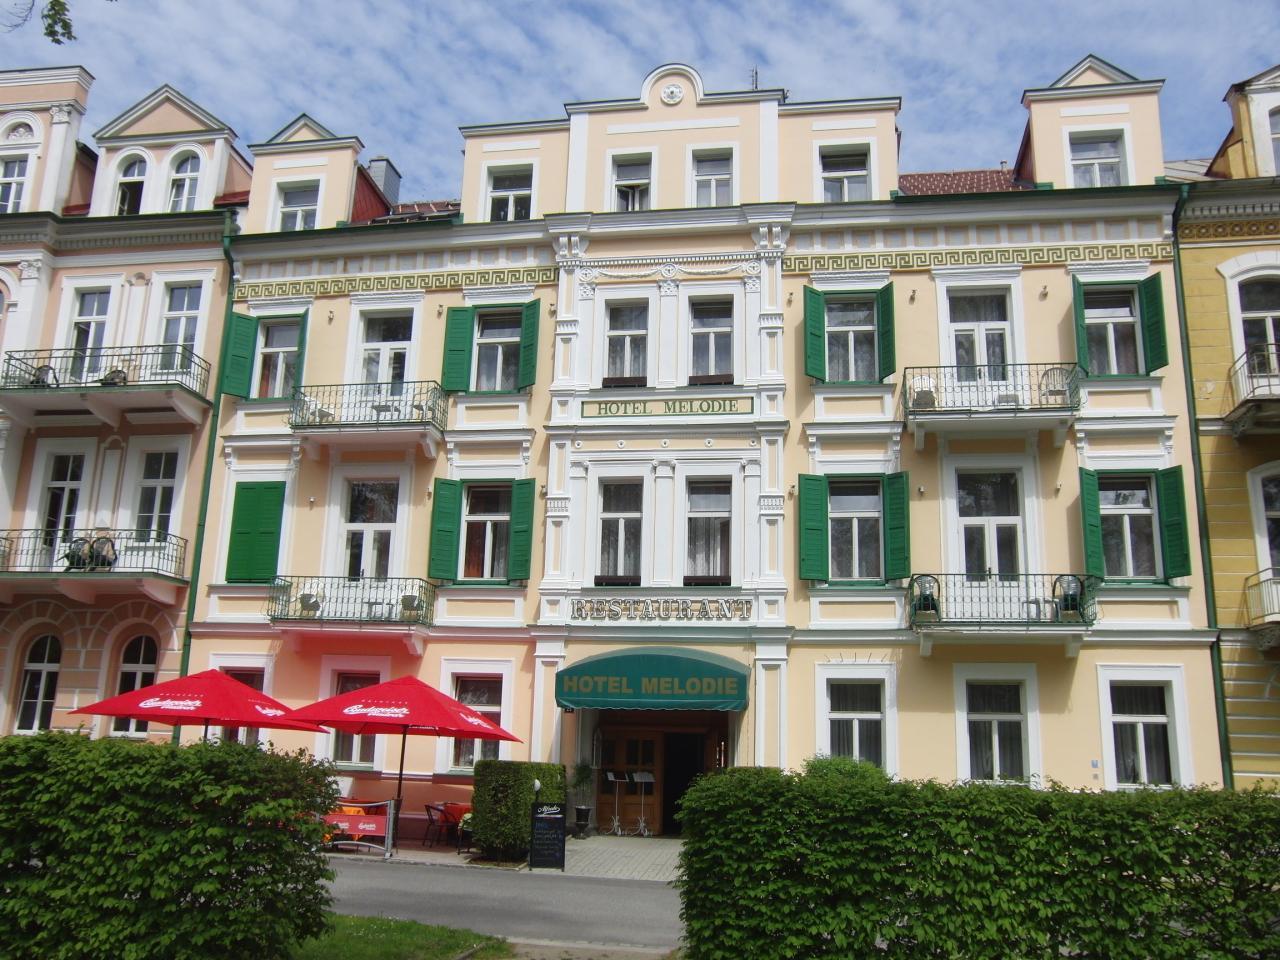 Františkovy lázně - Hotel Melodie, Seniorské pobyty po celý rok